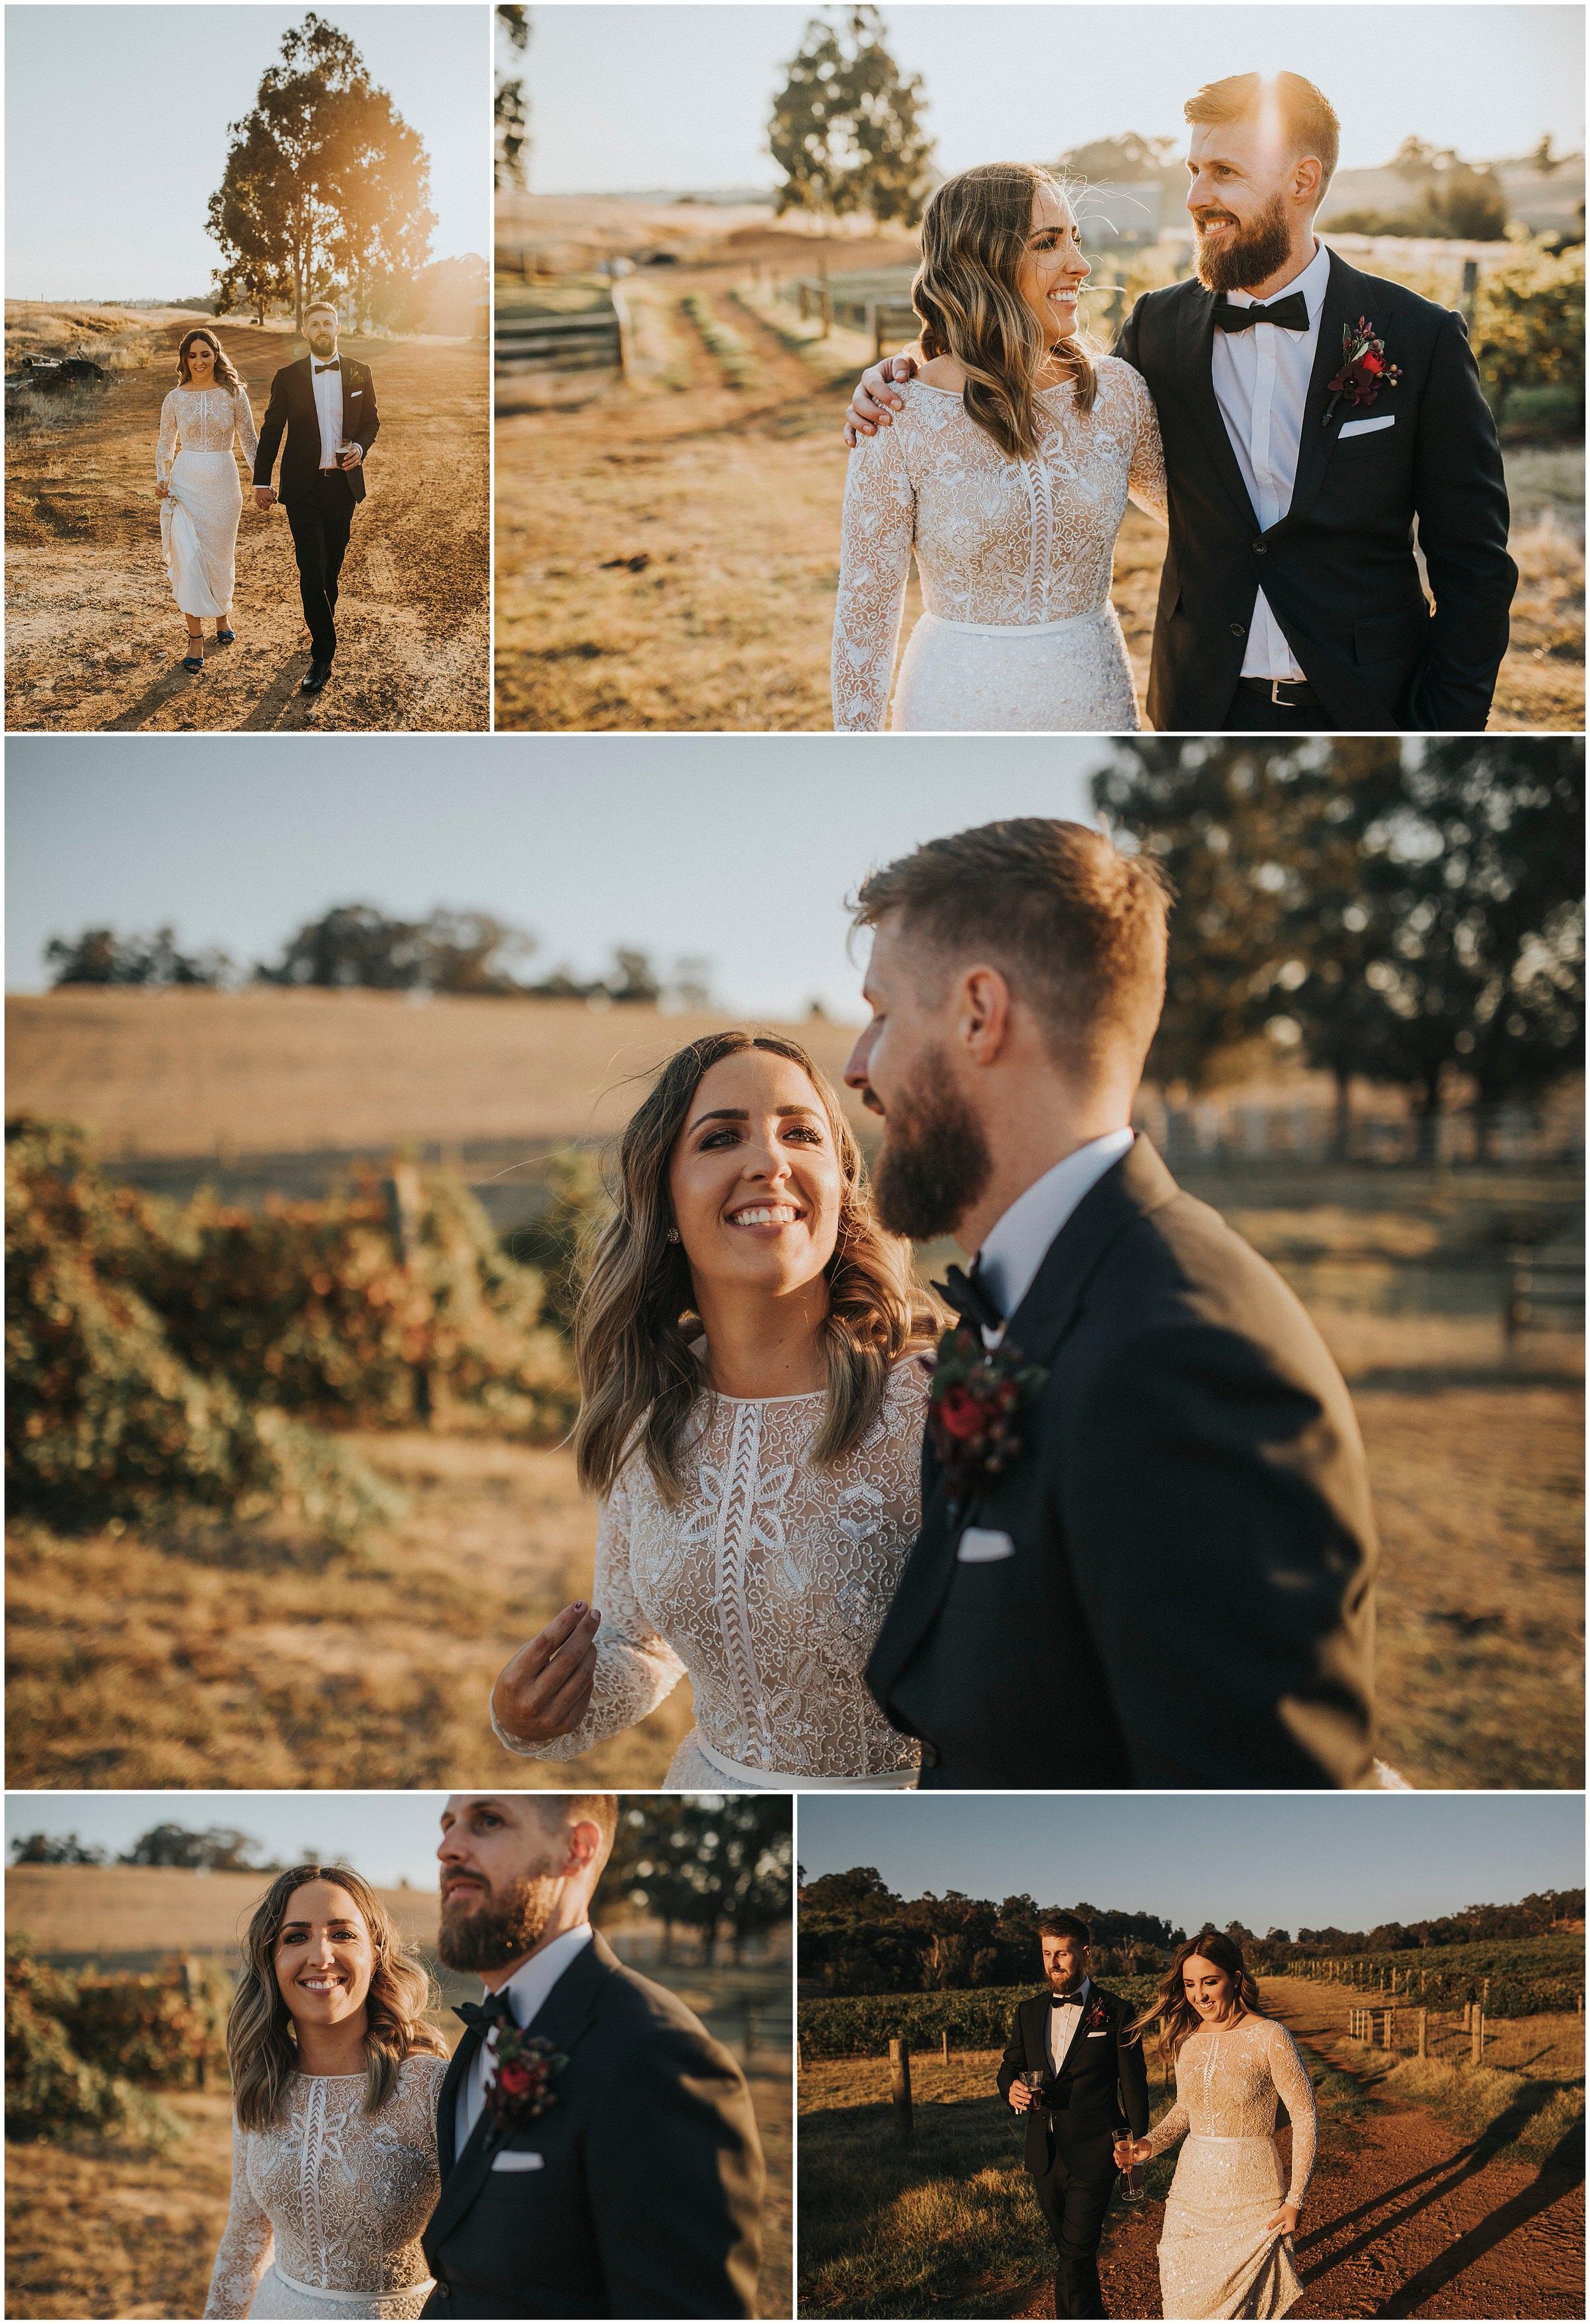 ferguson_valley_perth_wedding_photgorapher_keeper_creative_18.JPG